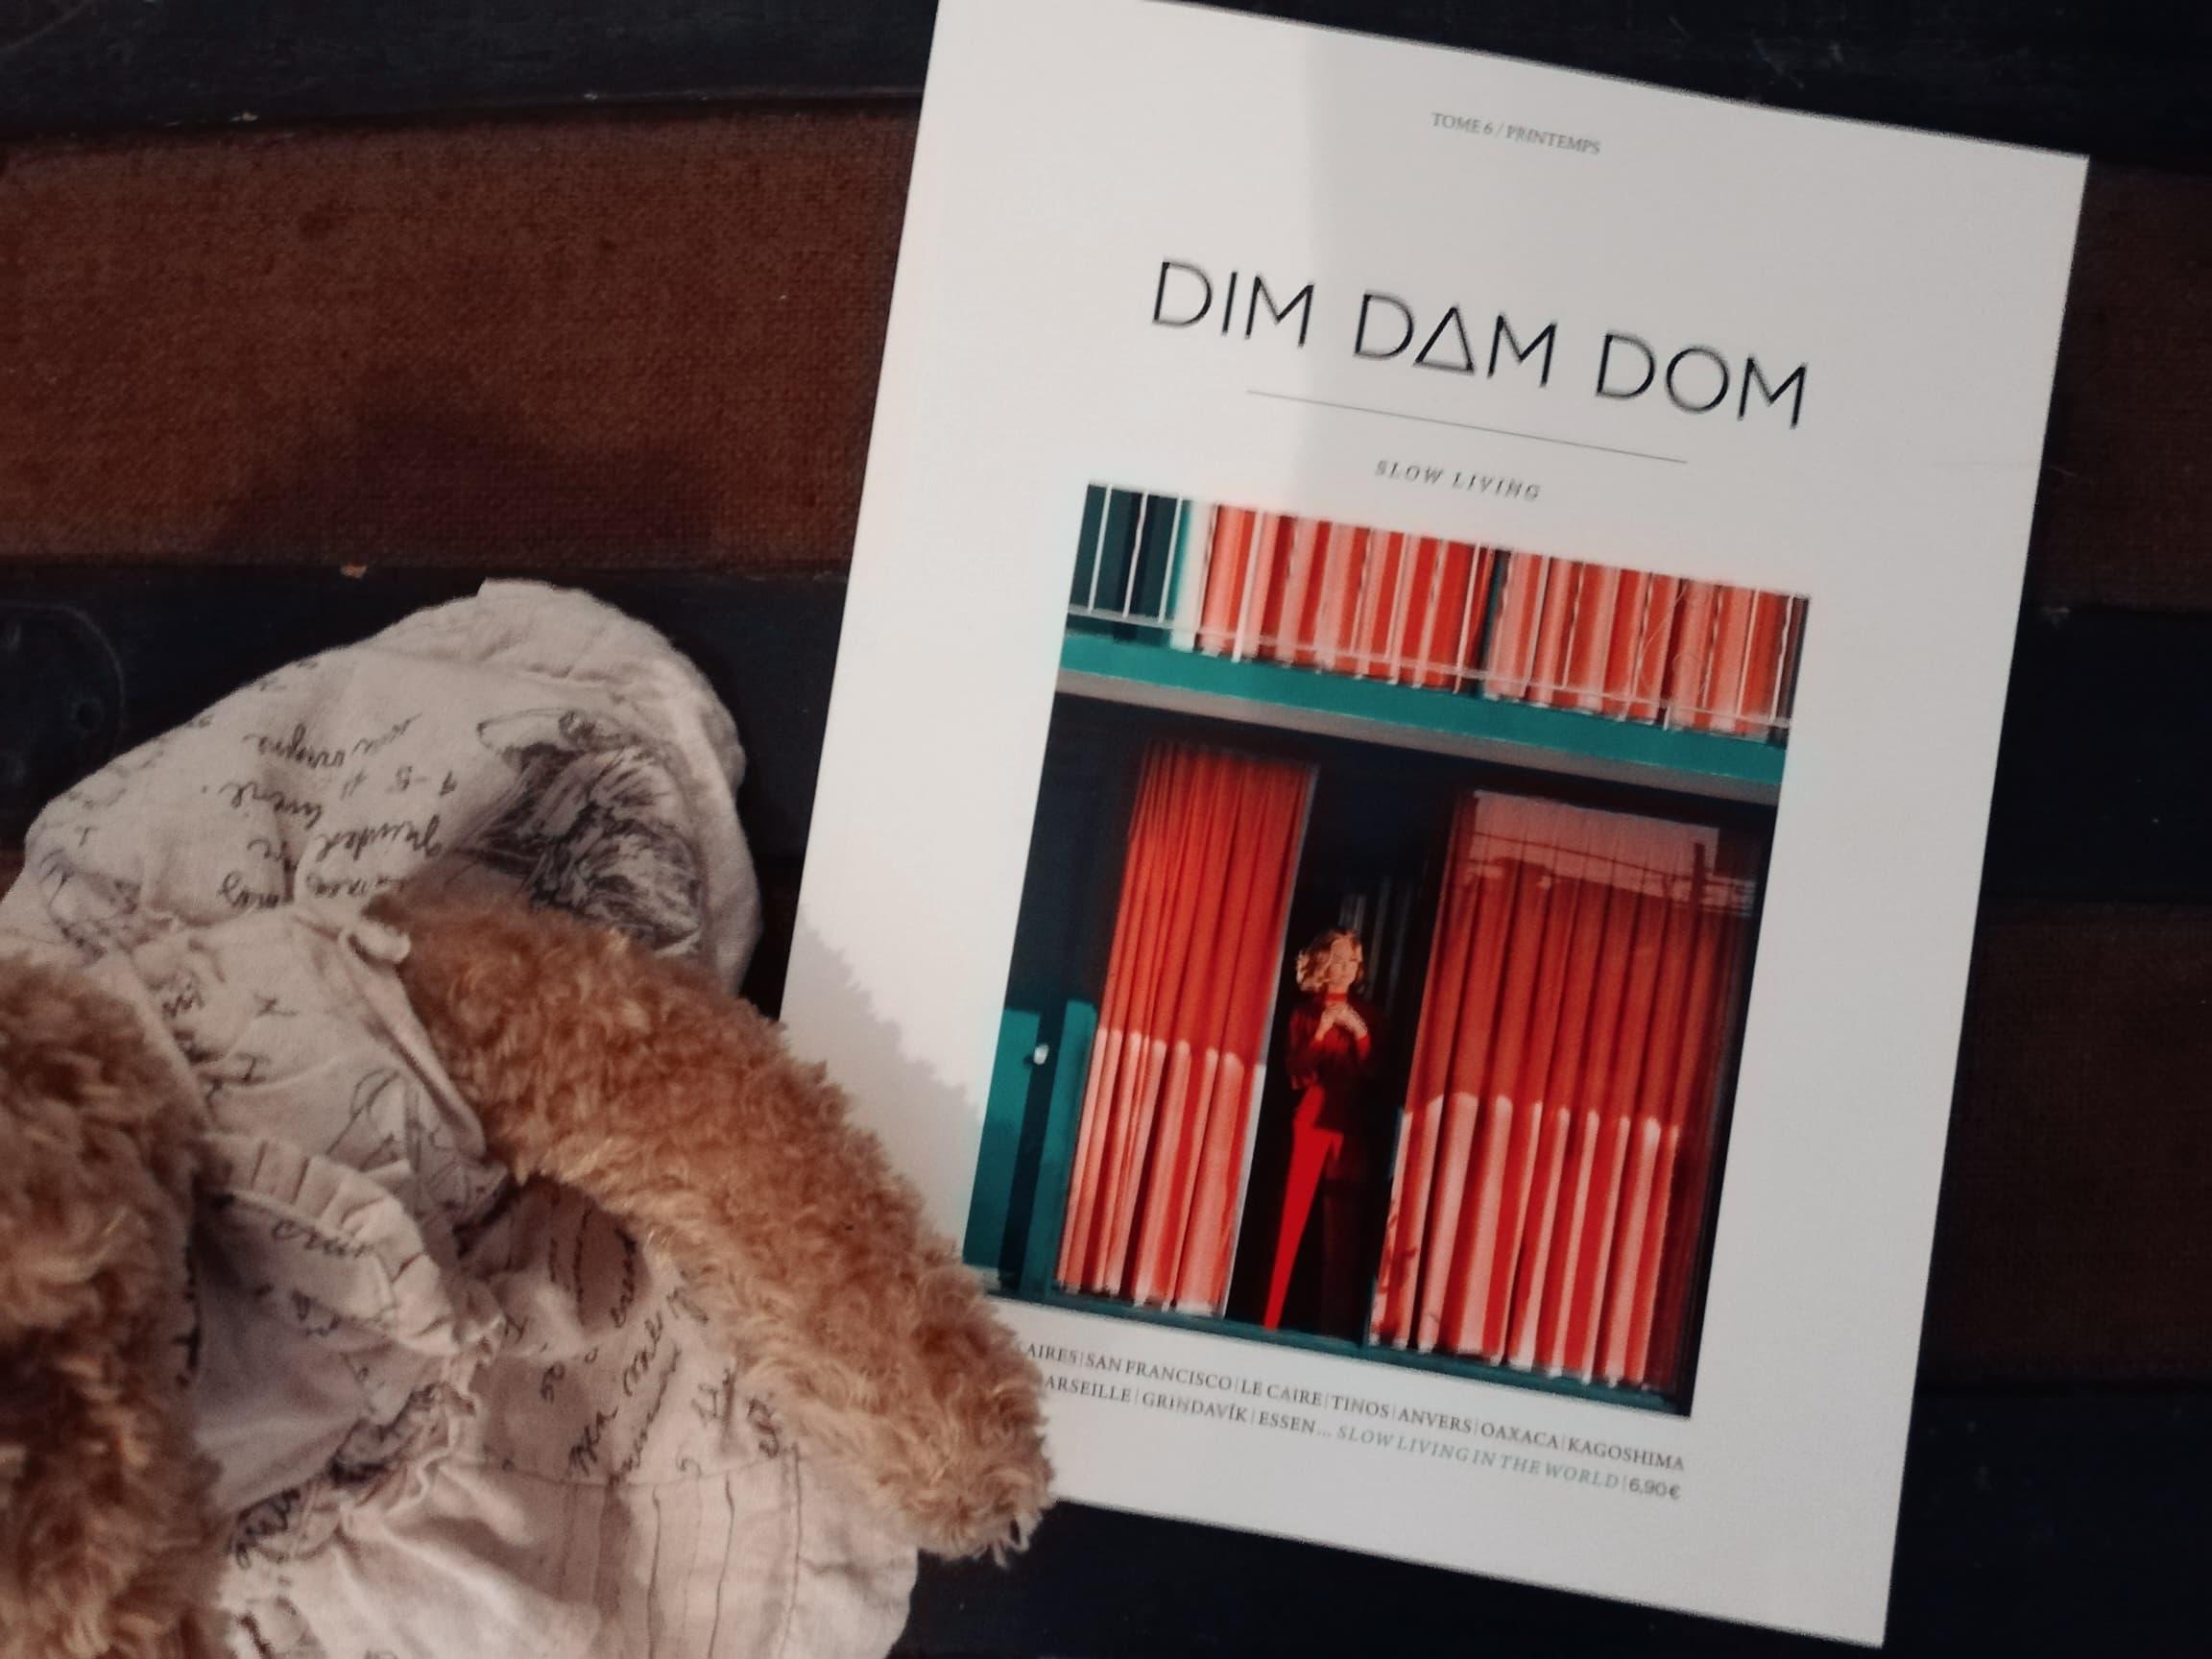 DIM DAM DOM - Louve